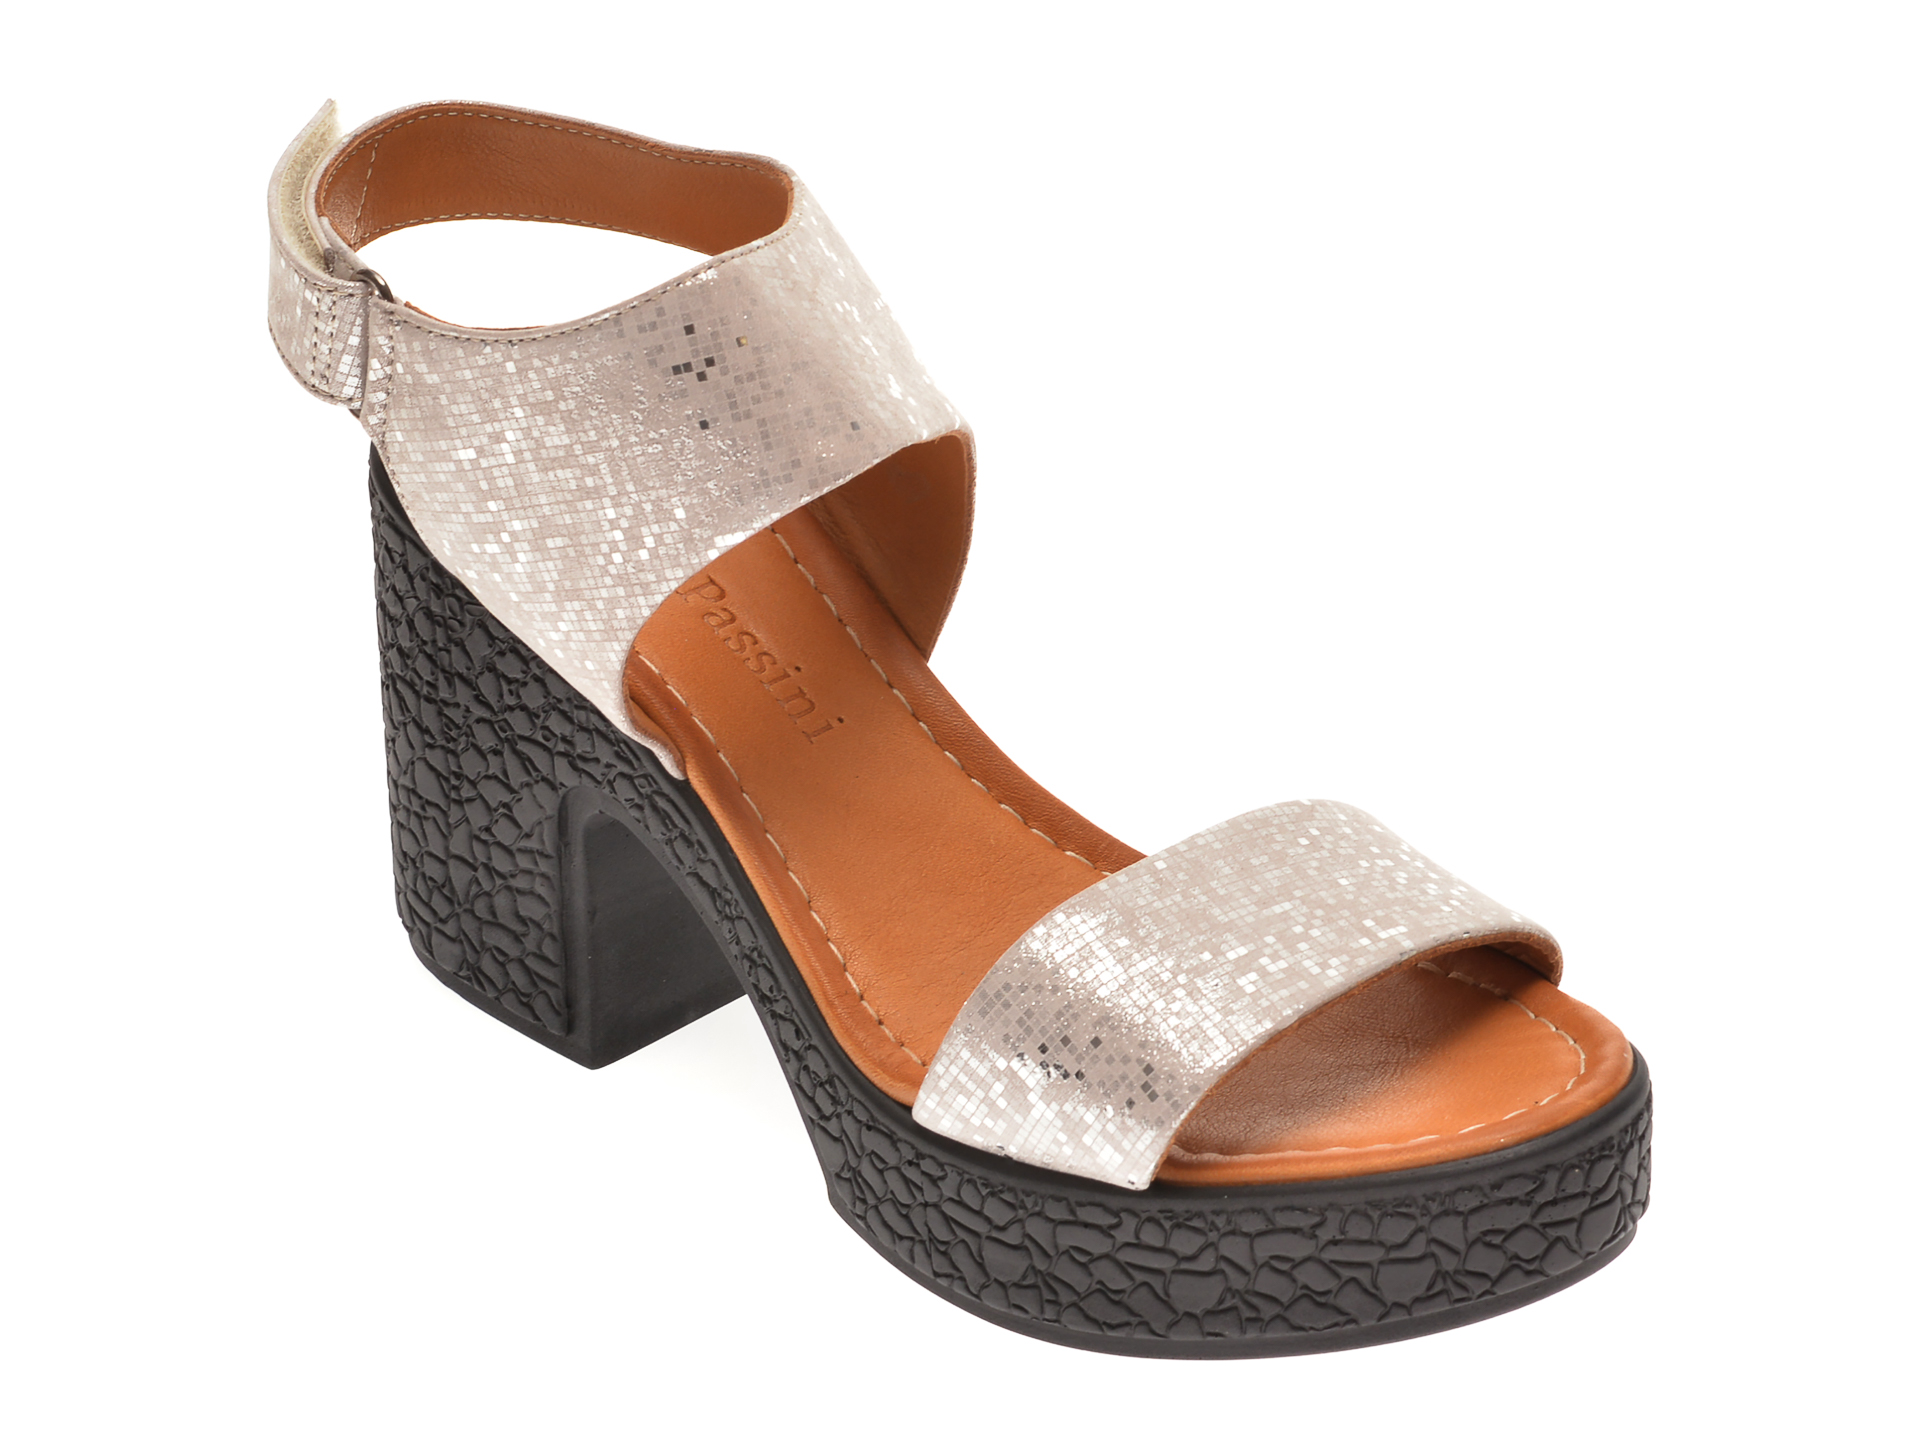 Sandale FLAVIA PASSINI bej, 1181335, din piele naturala imagine